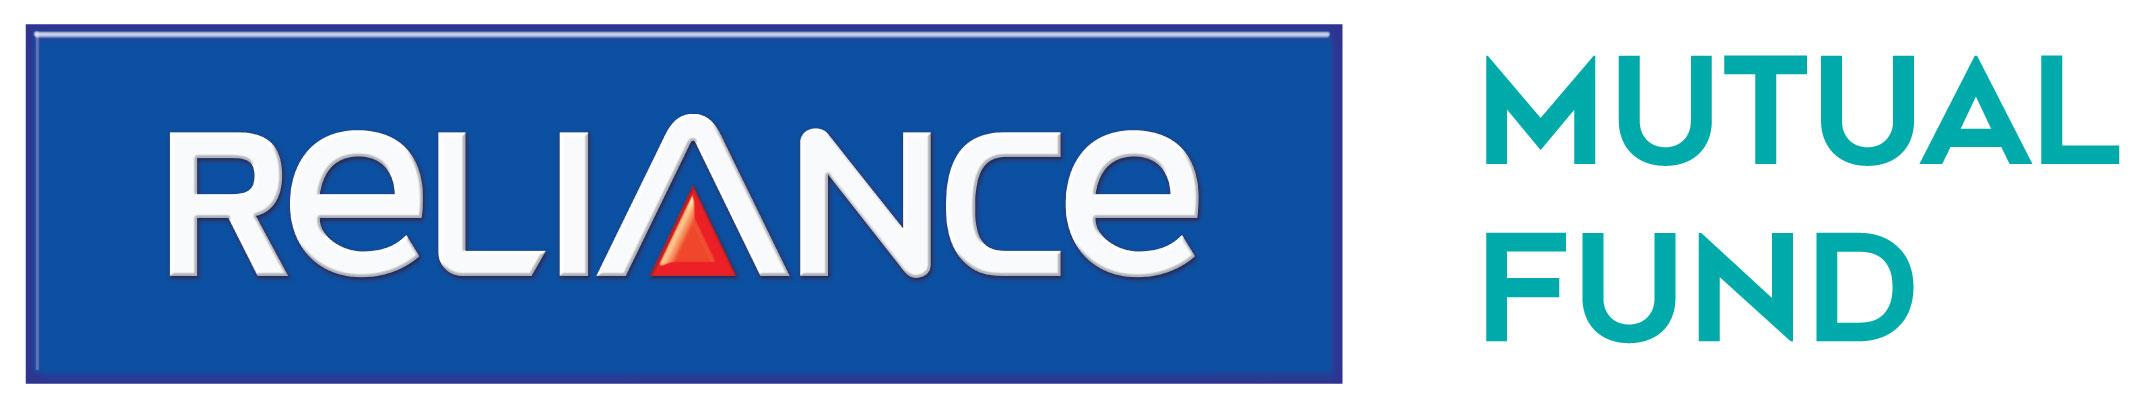 Reliance Mutual Fund Jamnagar Office Mutual Fund